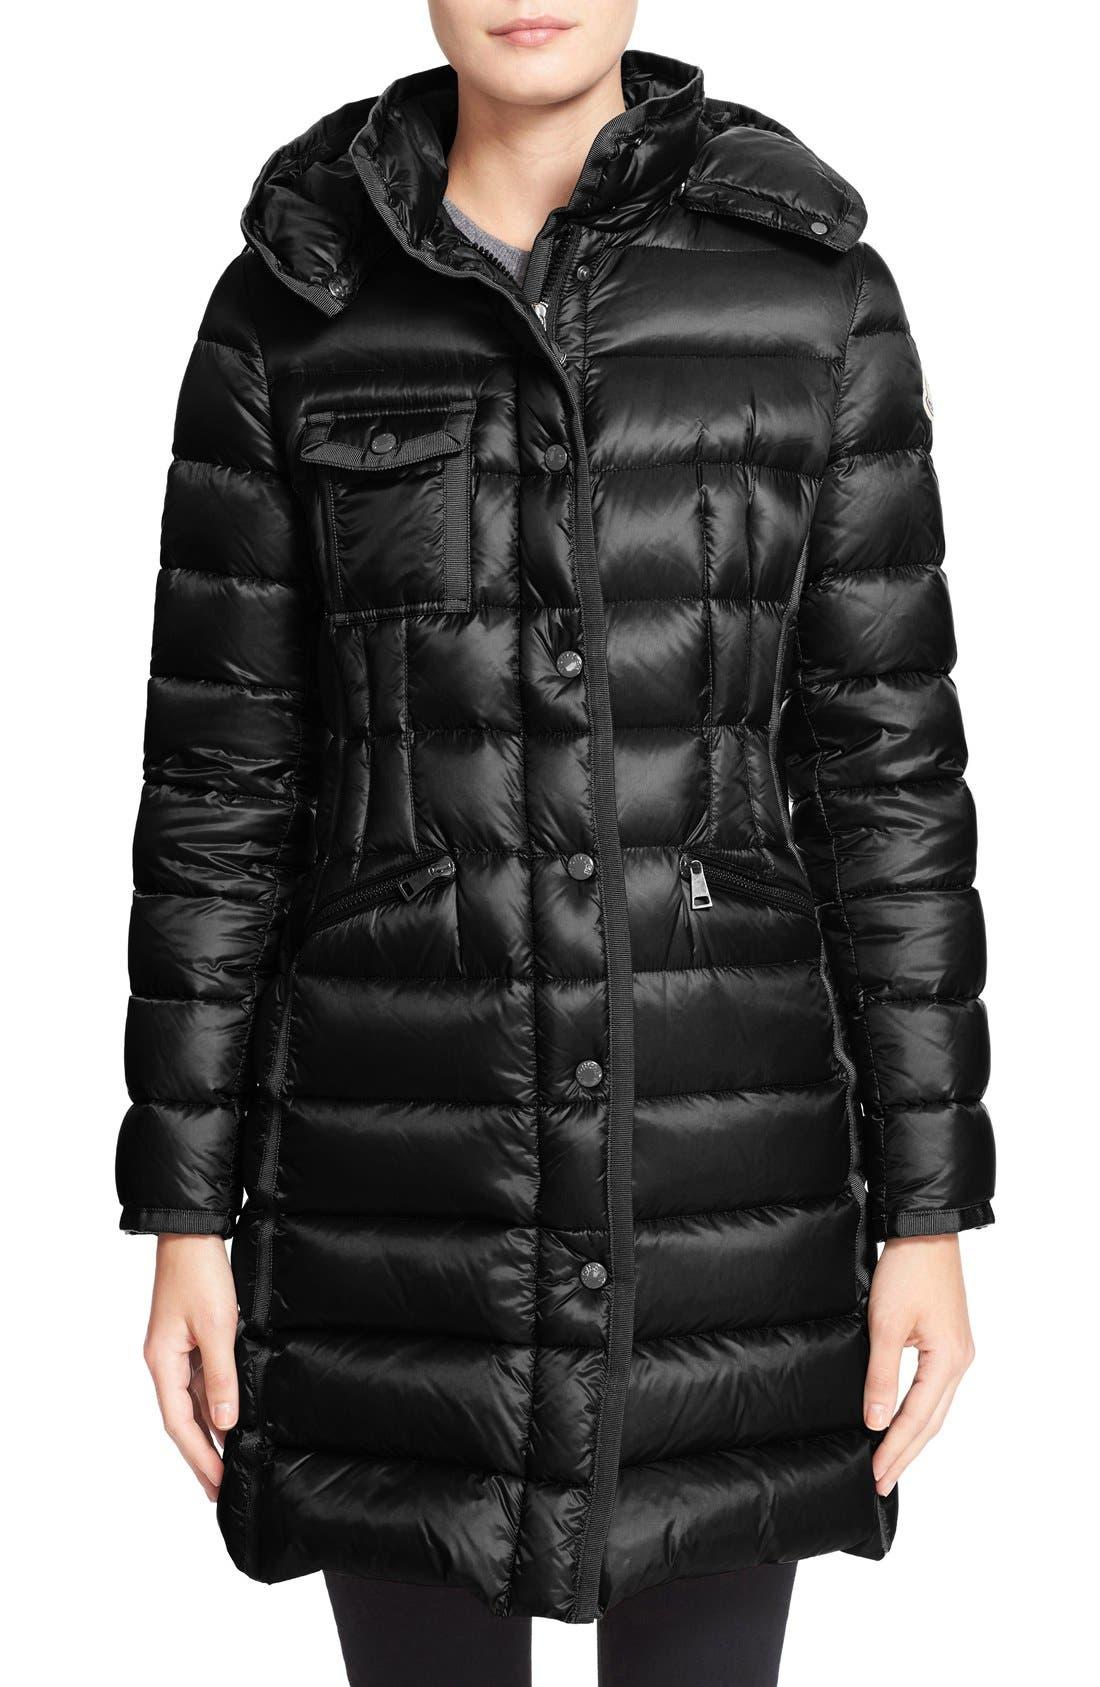 MONCLER 'Hermine' Grosgrain Trim Water Resistant Down Coat, Main, color, BLACK